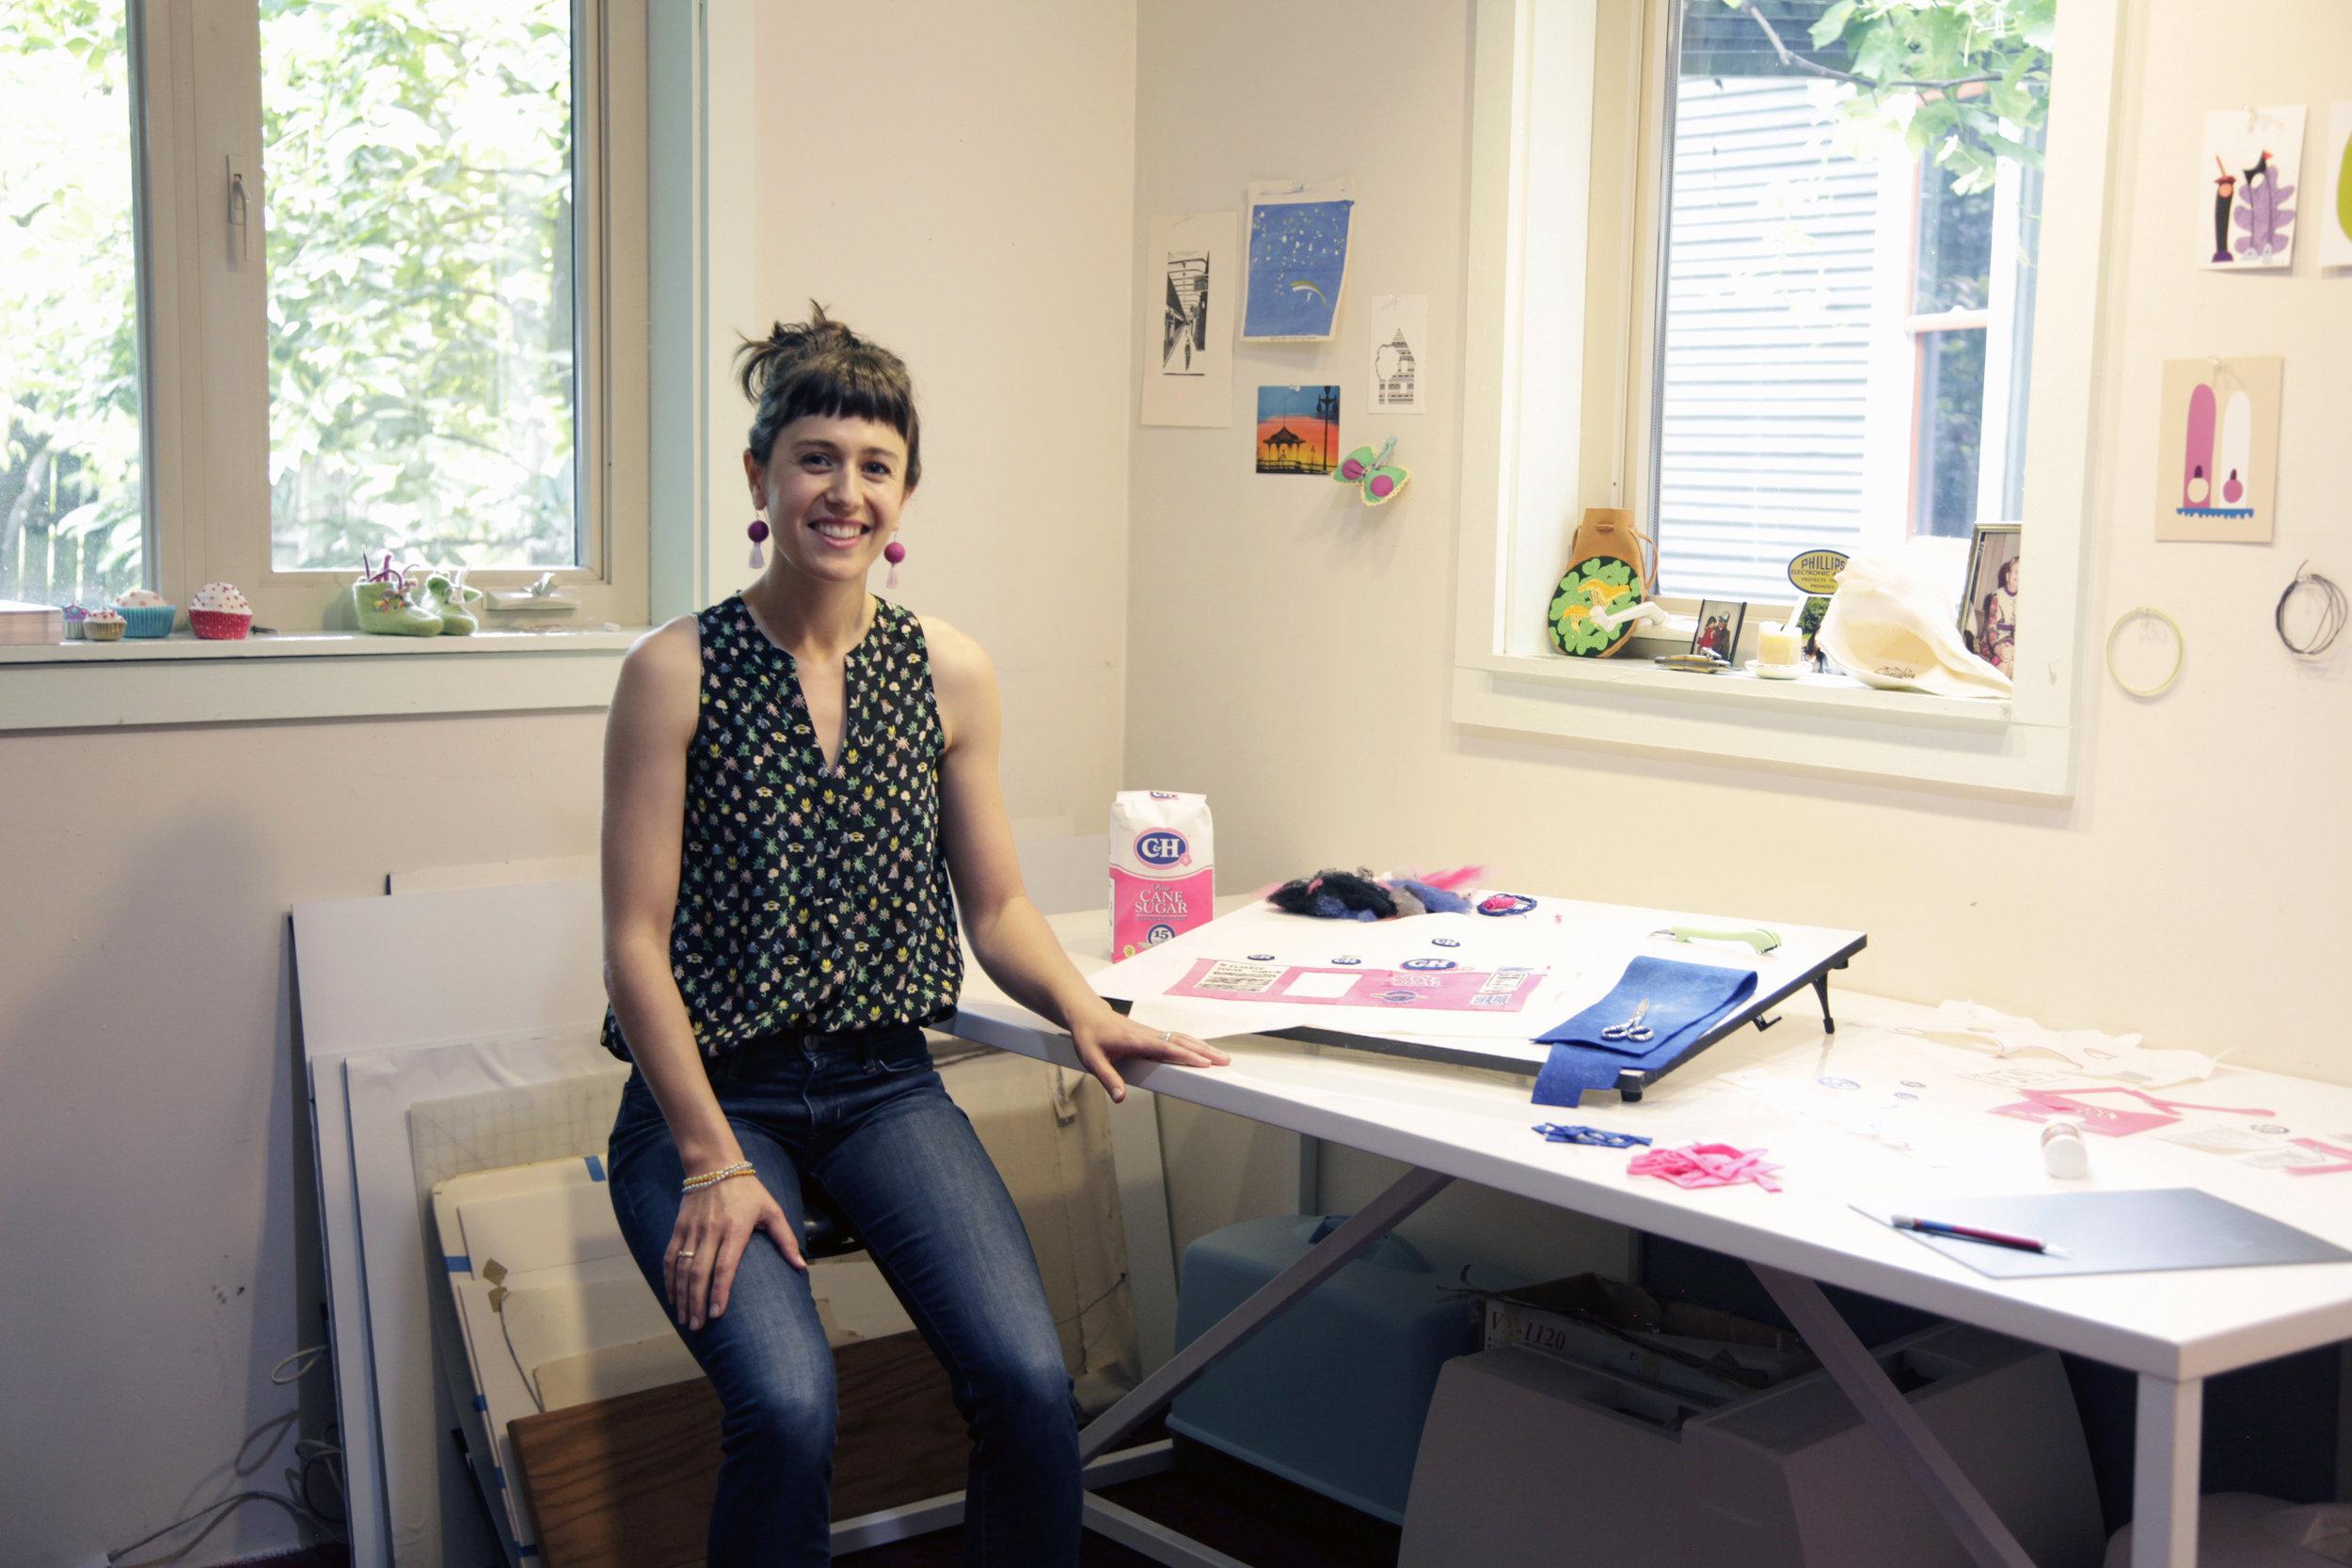 LeBrie Rich in her studio